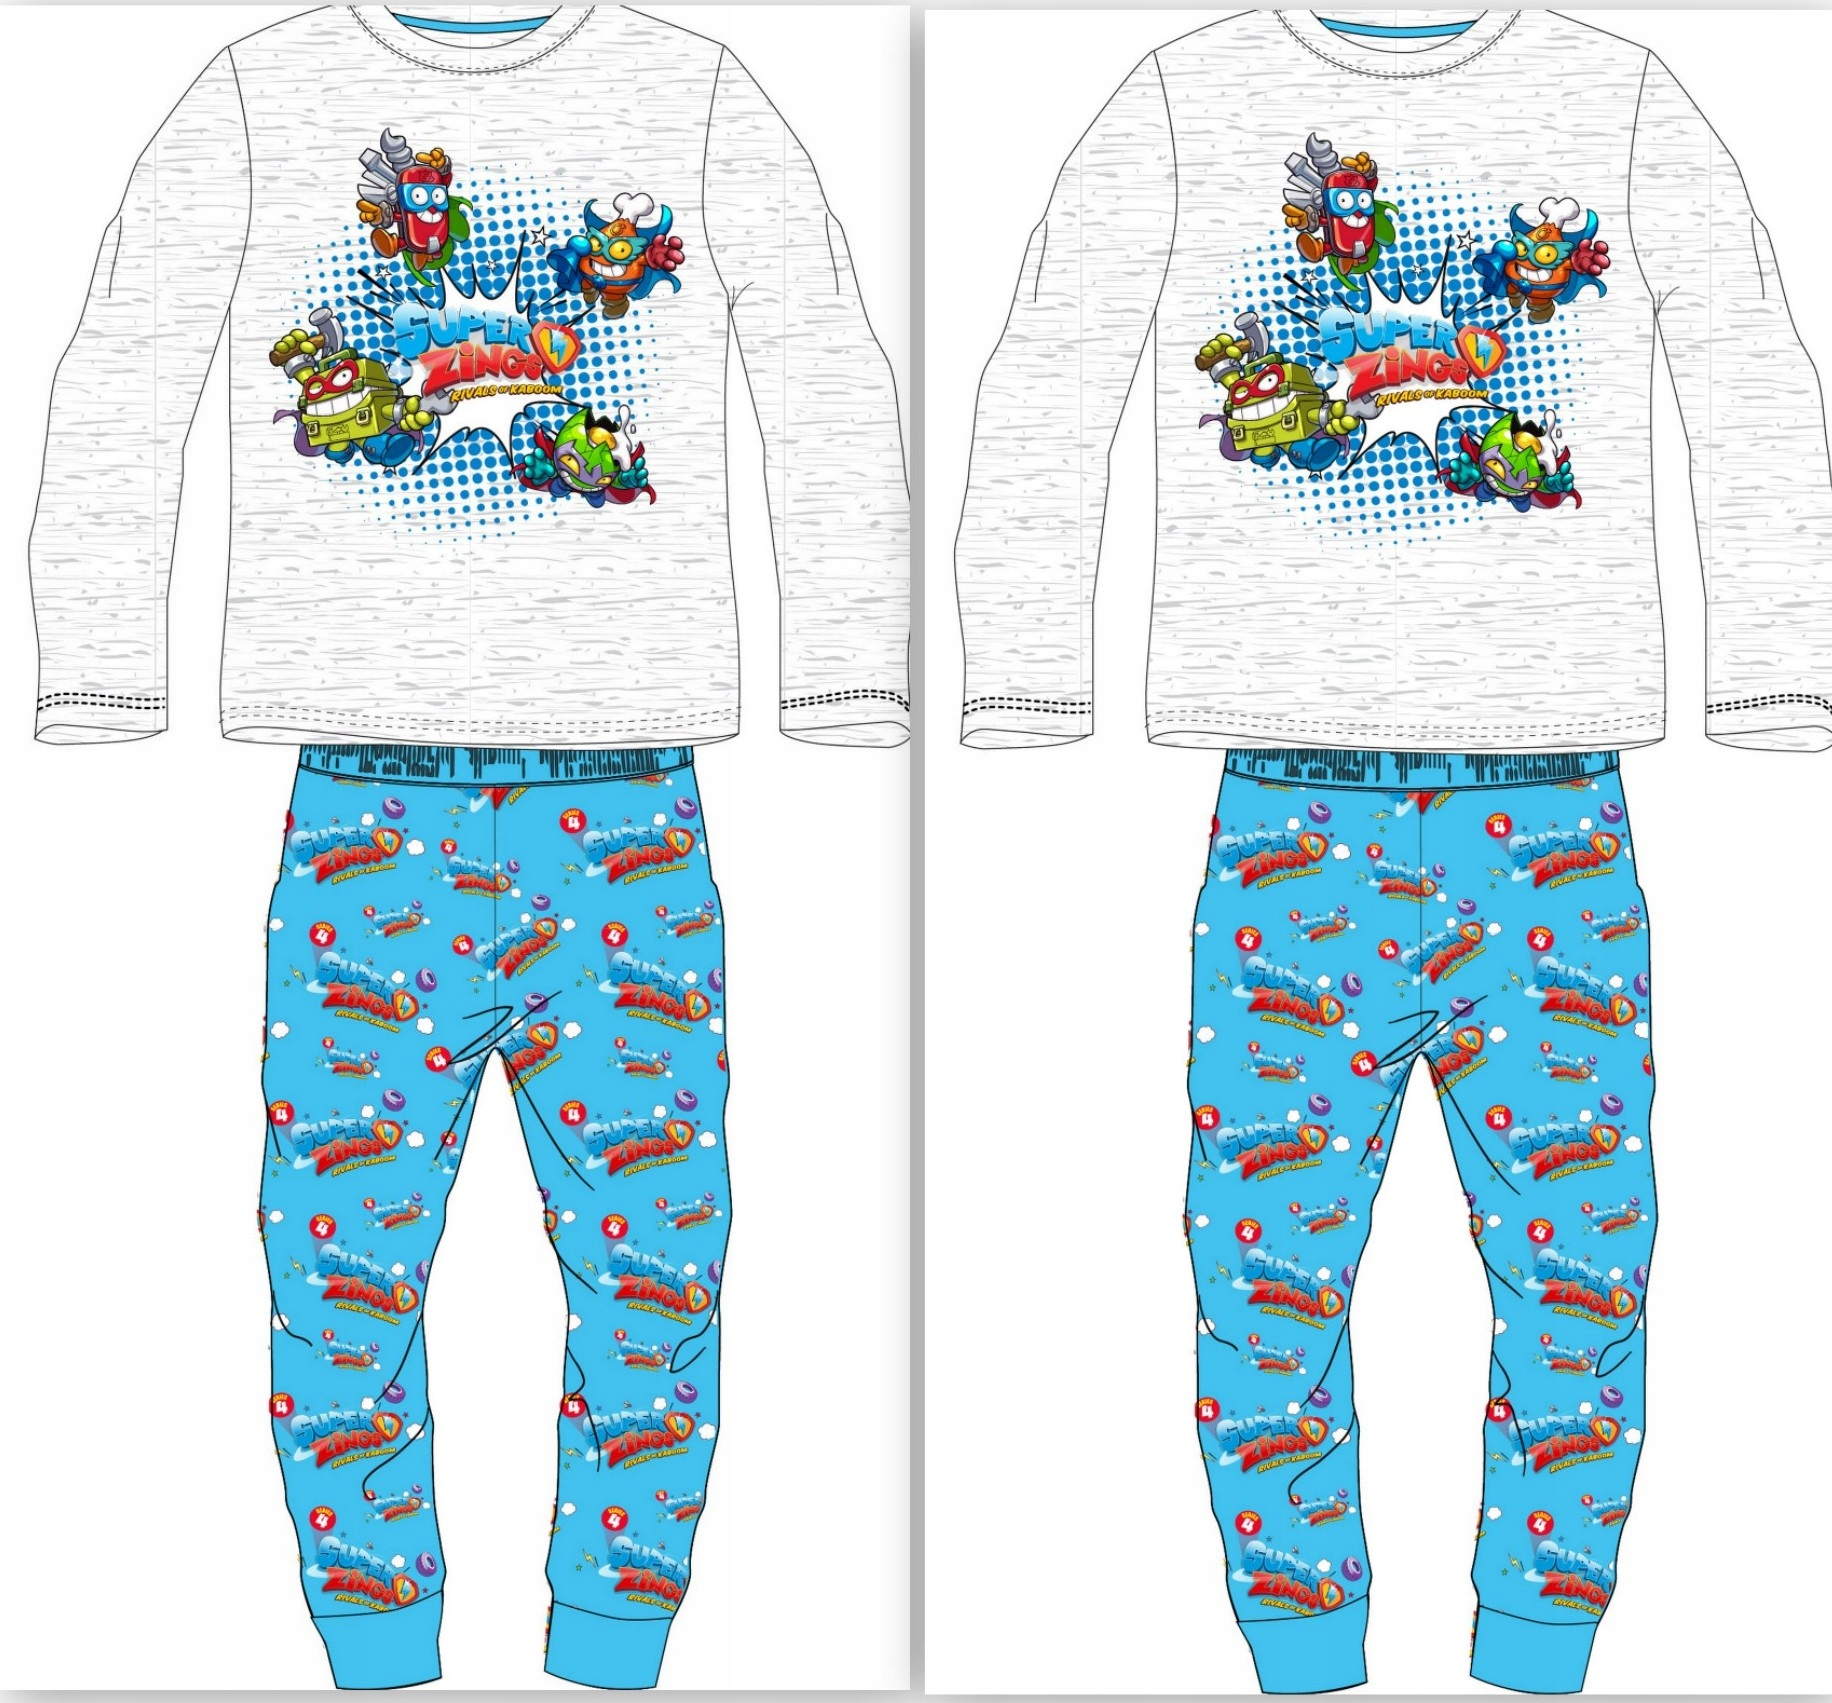 Pyžamo SUPER ZINKS r122 100% BAVLNA